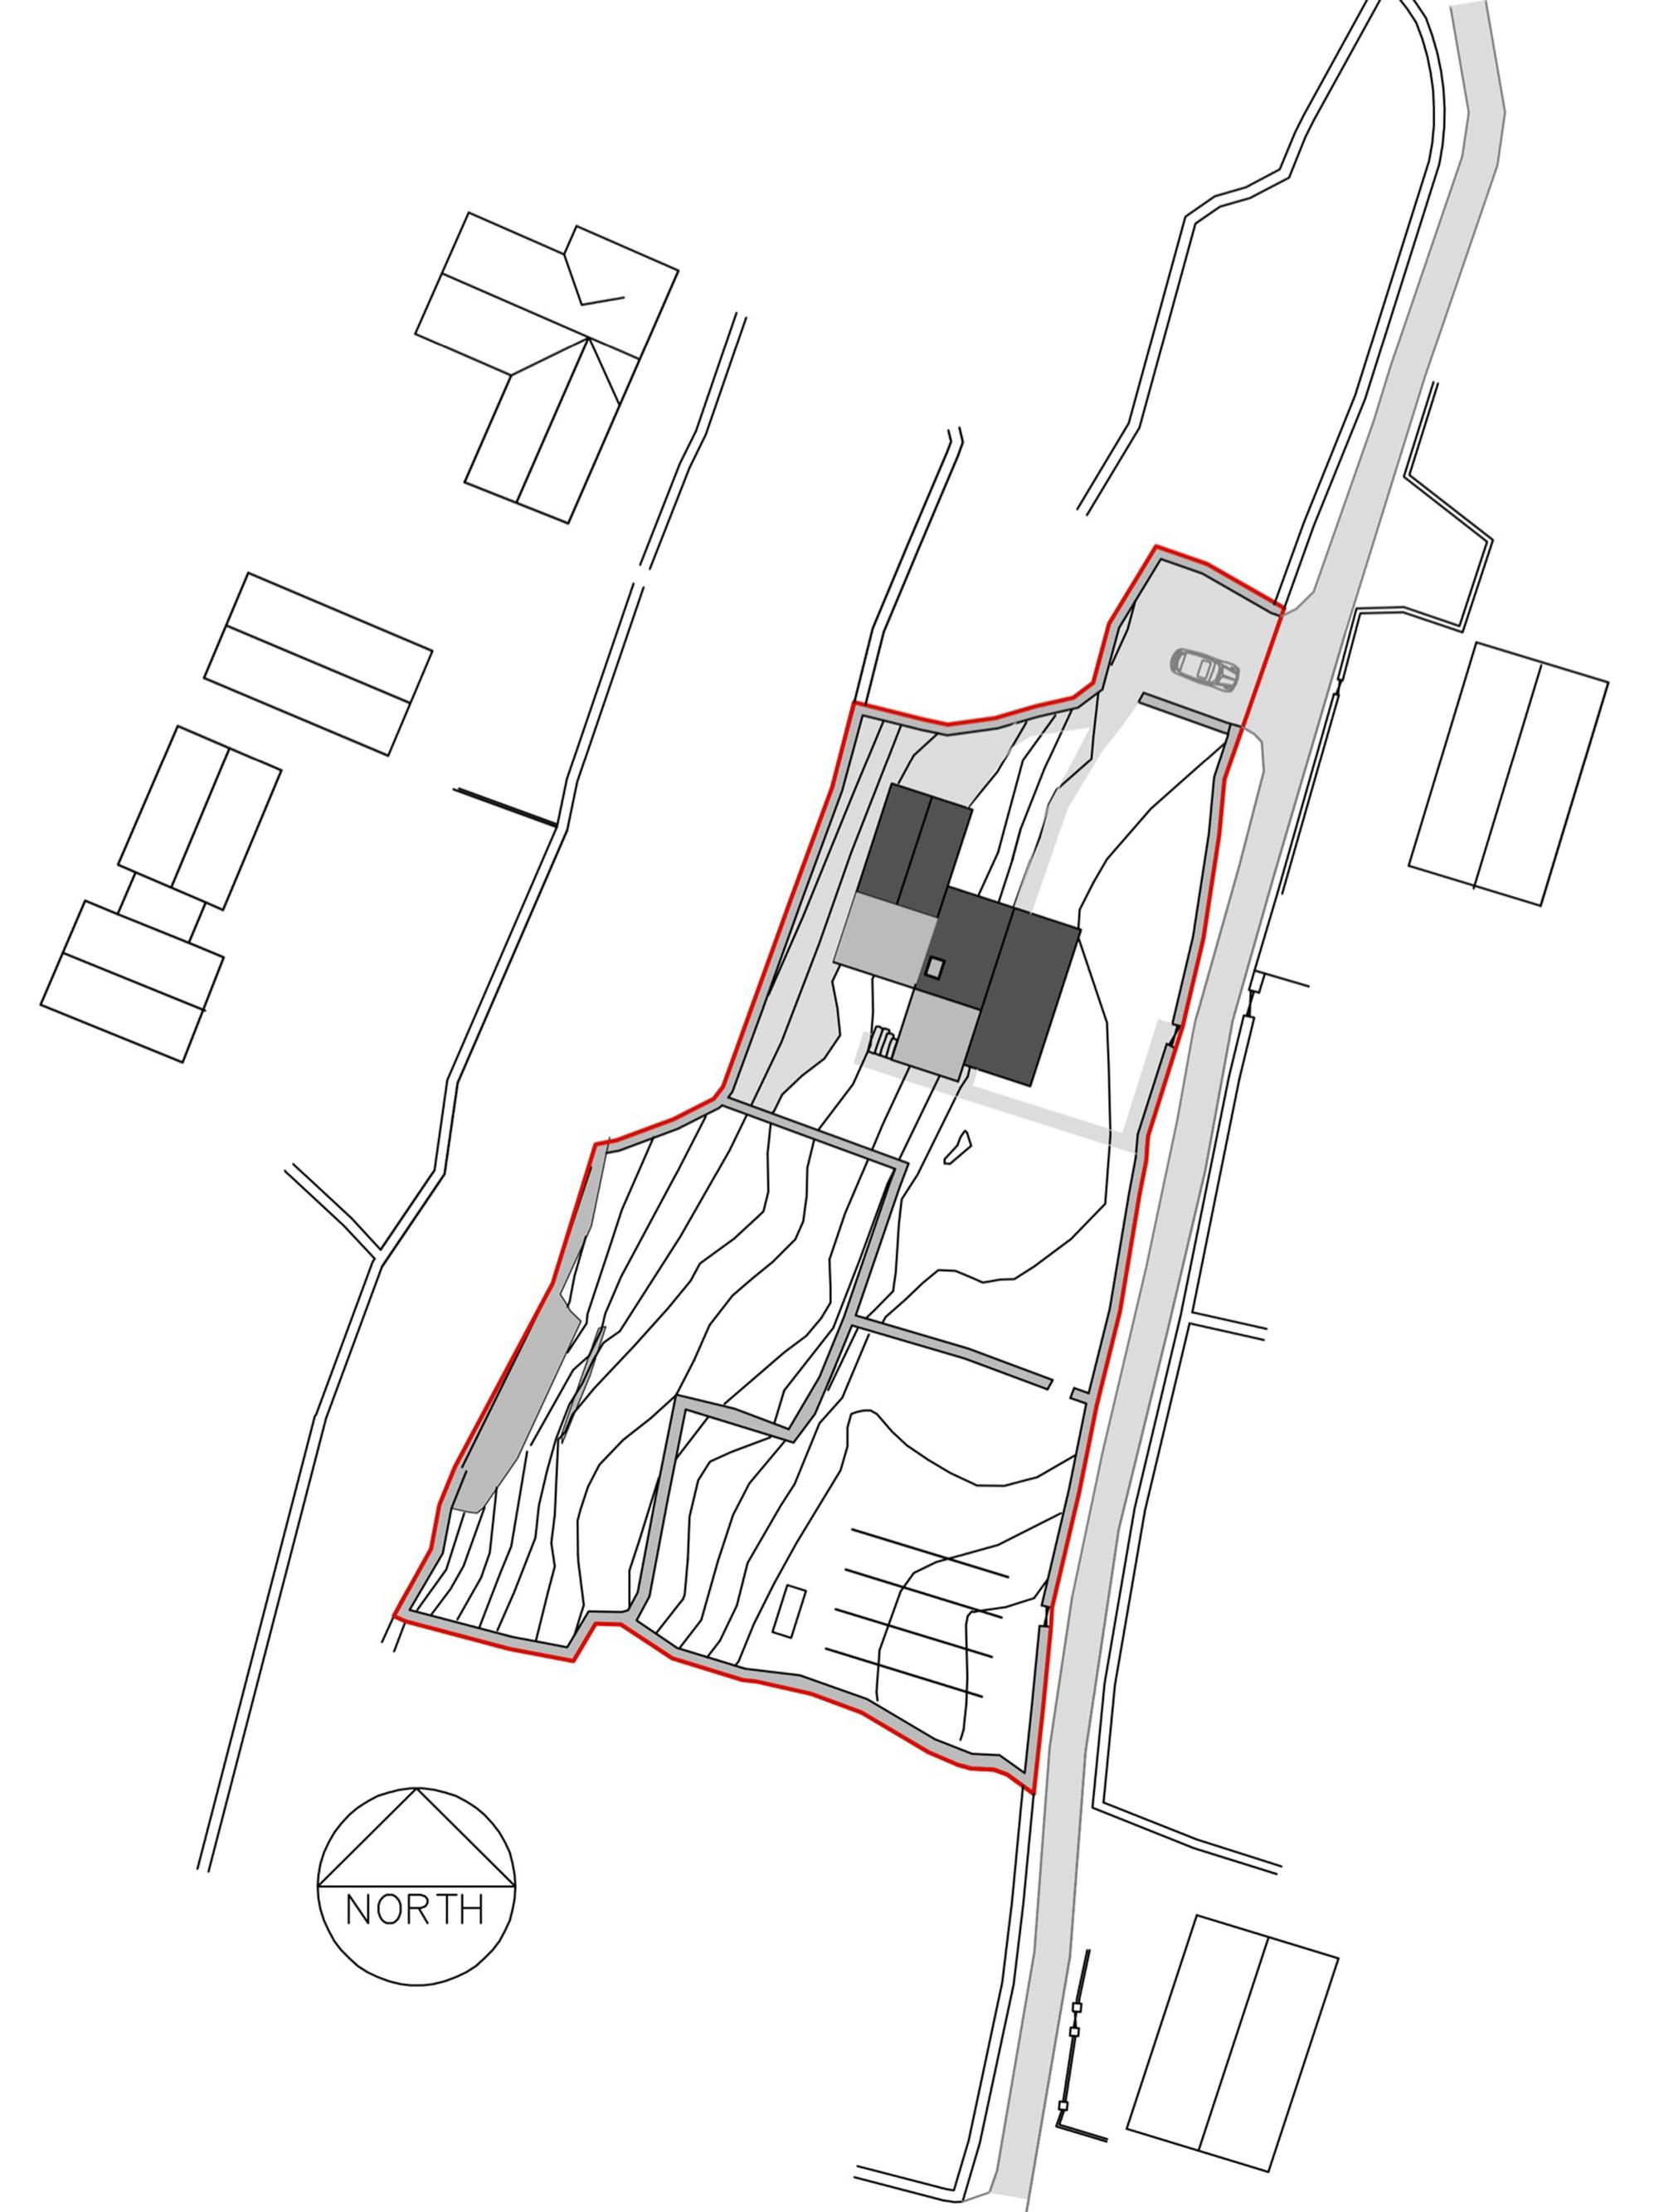 Island Dwelling plan 2